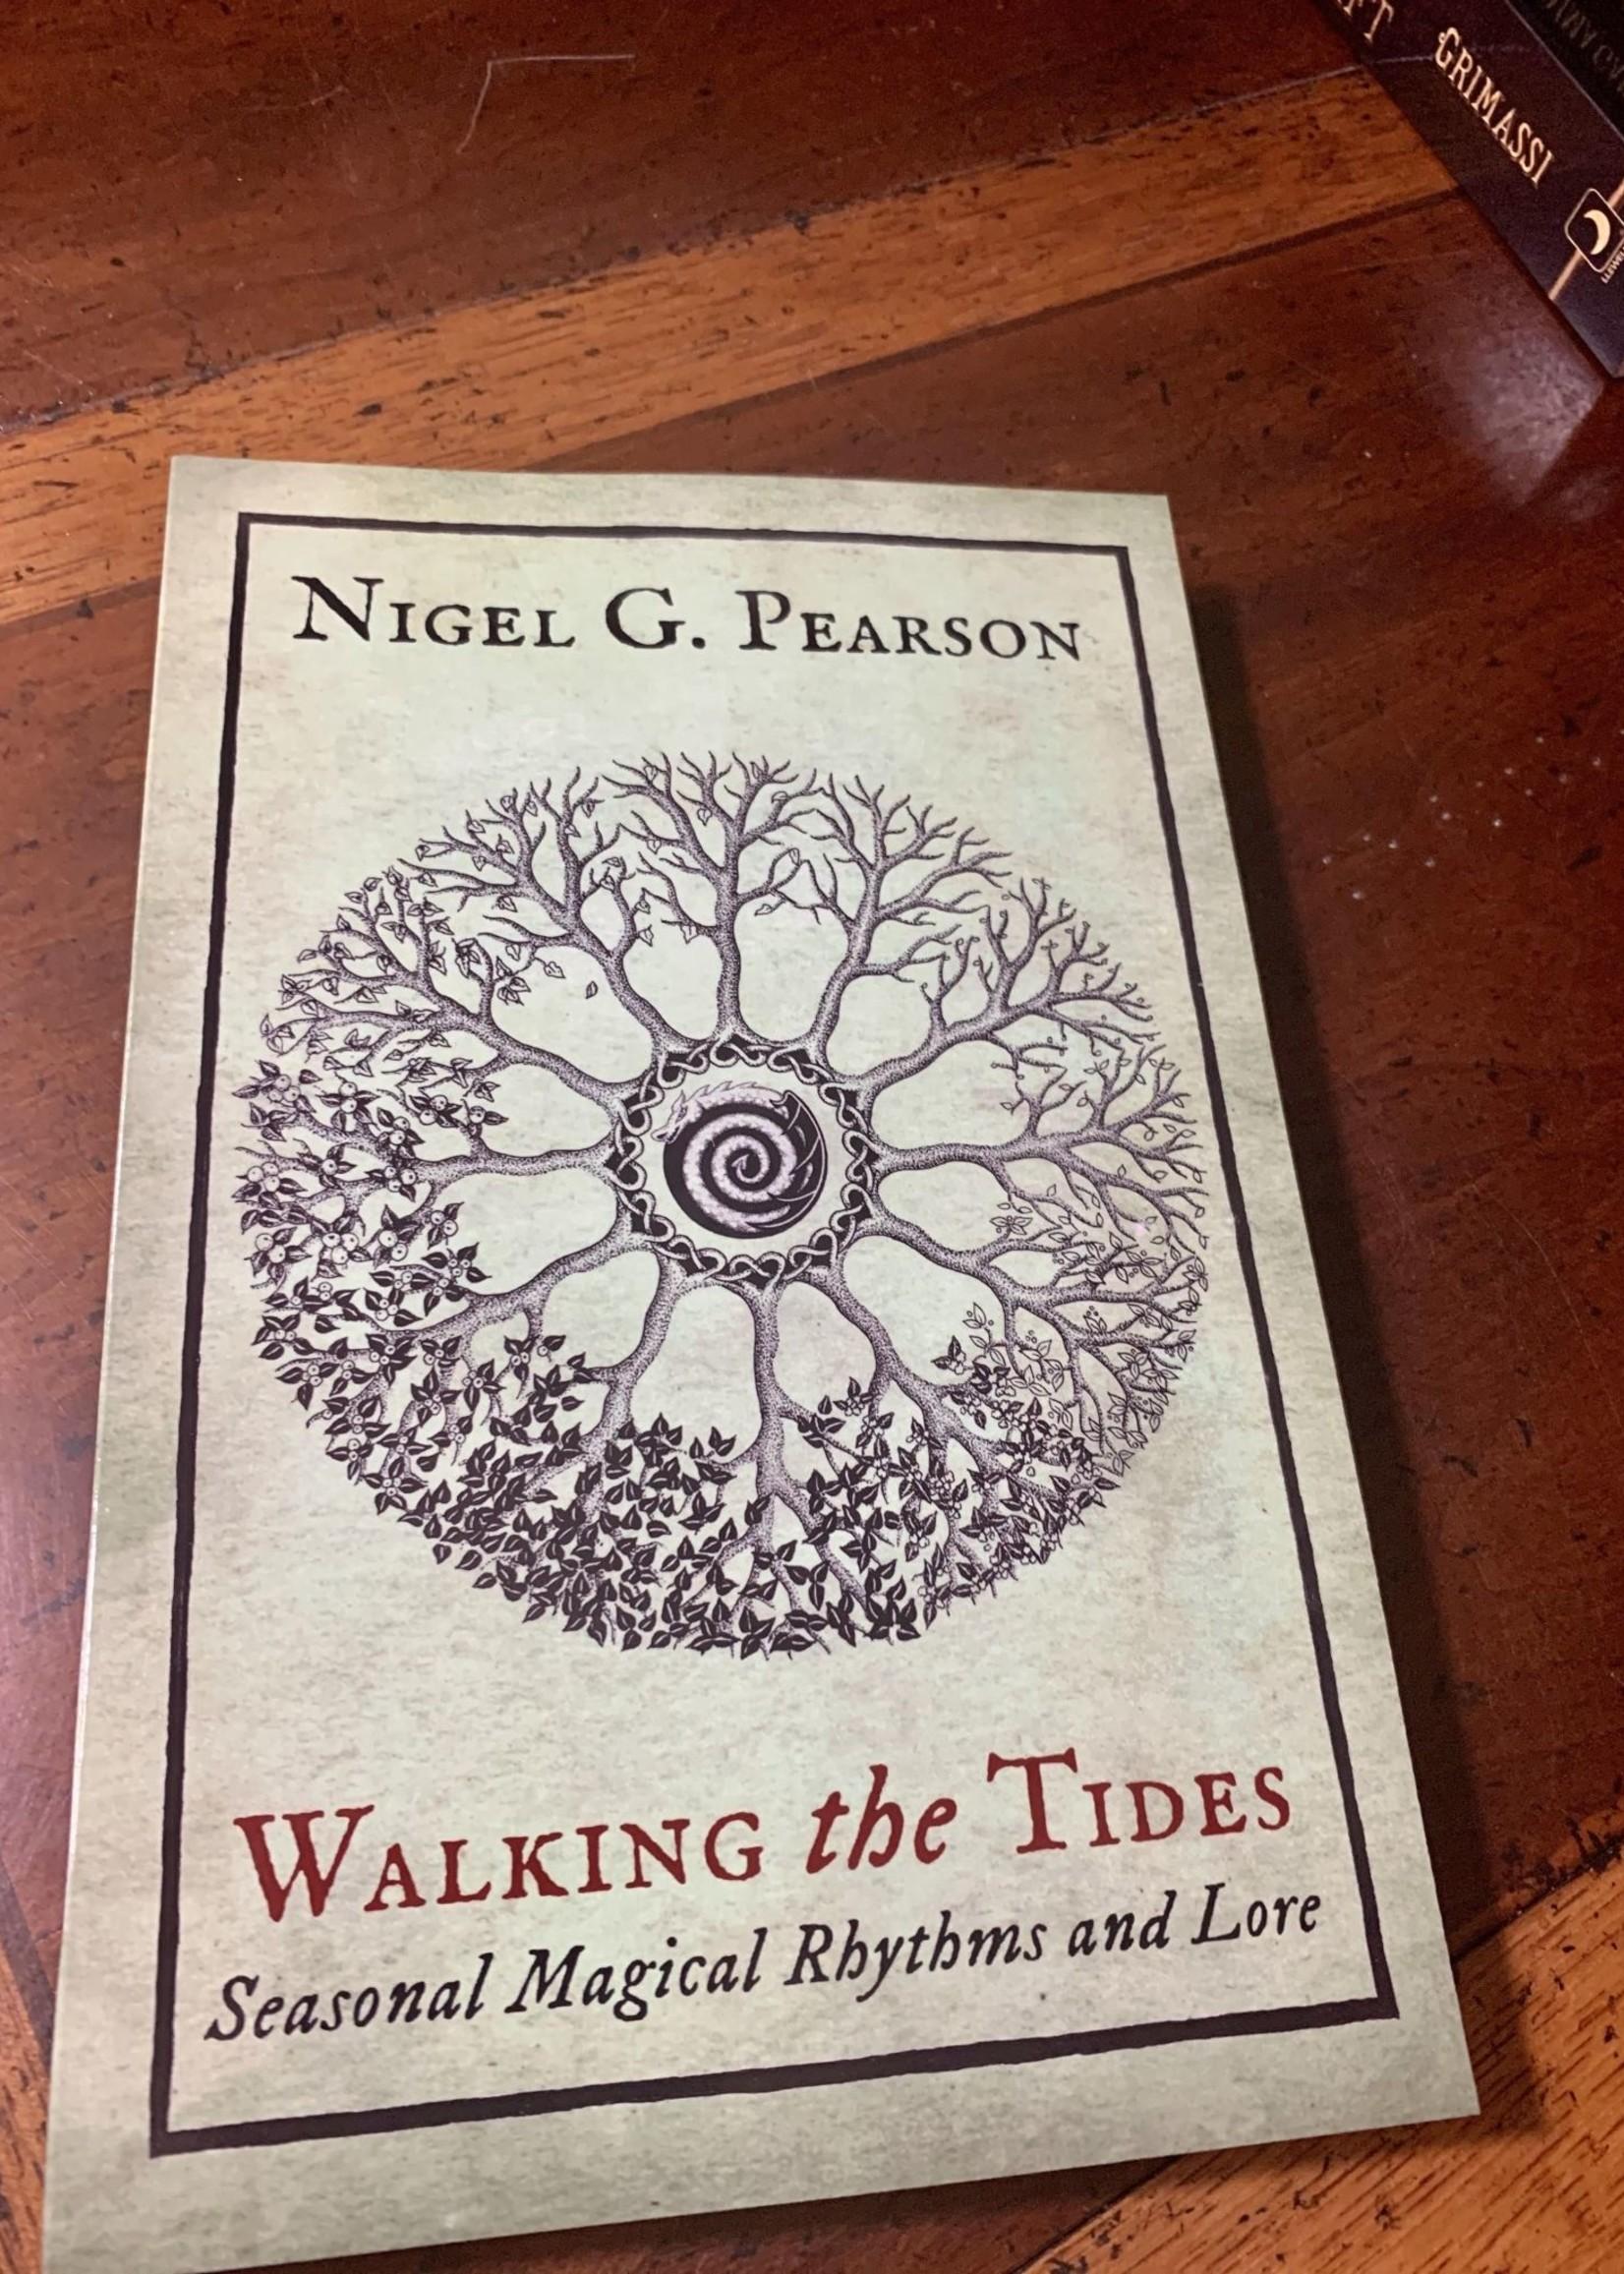 Walking The Tides - Nigel G. Pearson